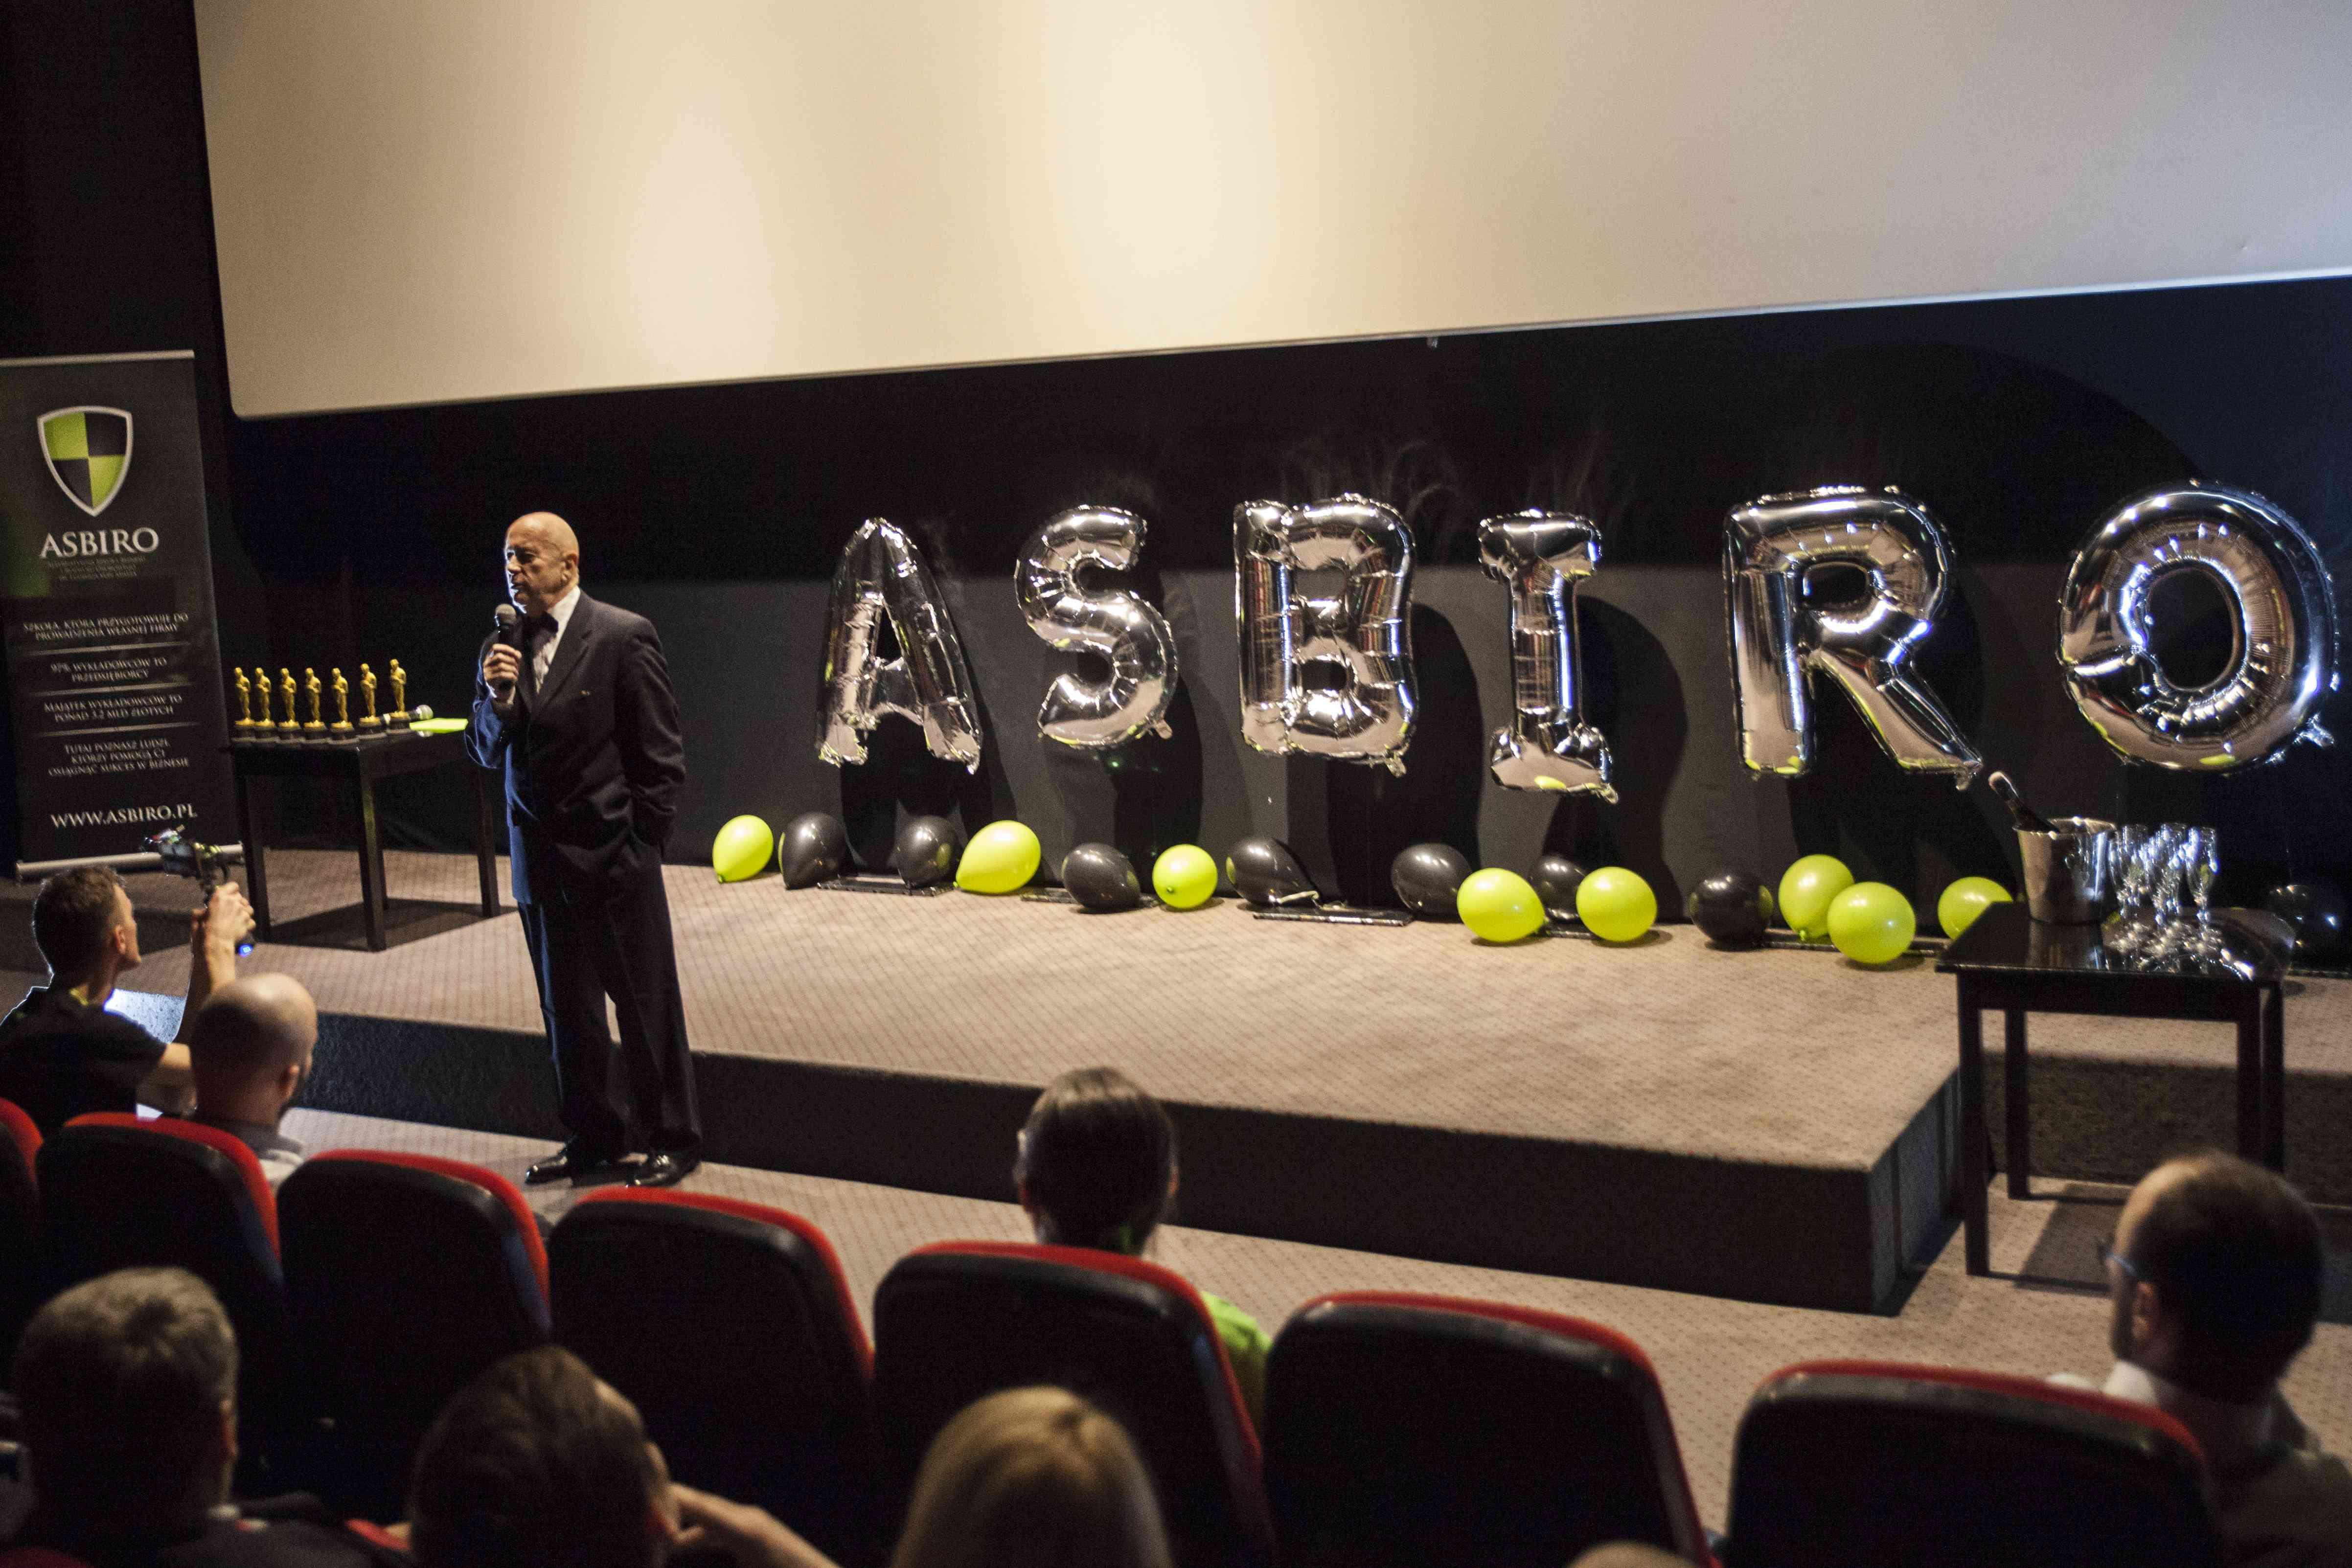 premiera Filmu ASBiRO